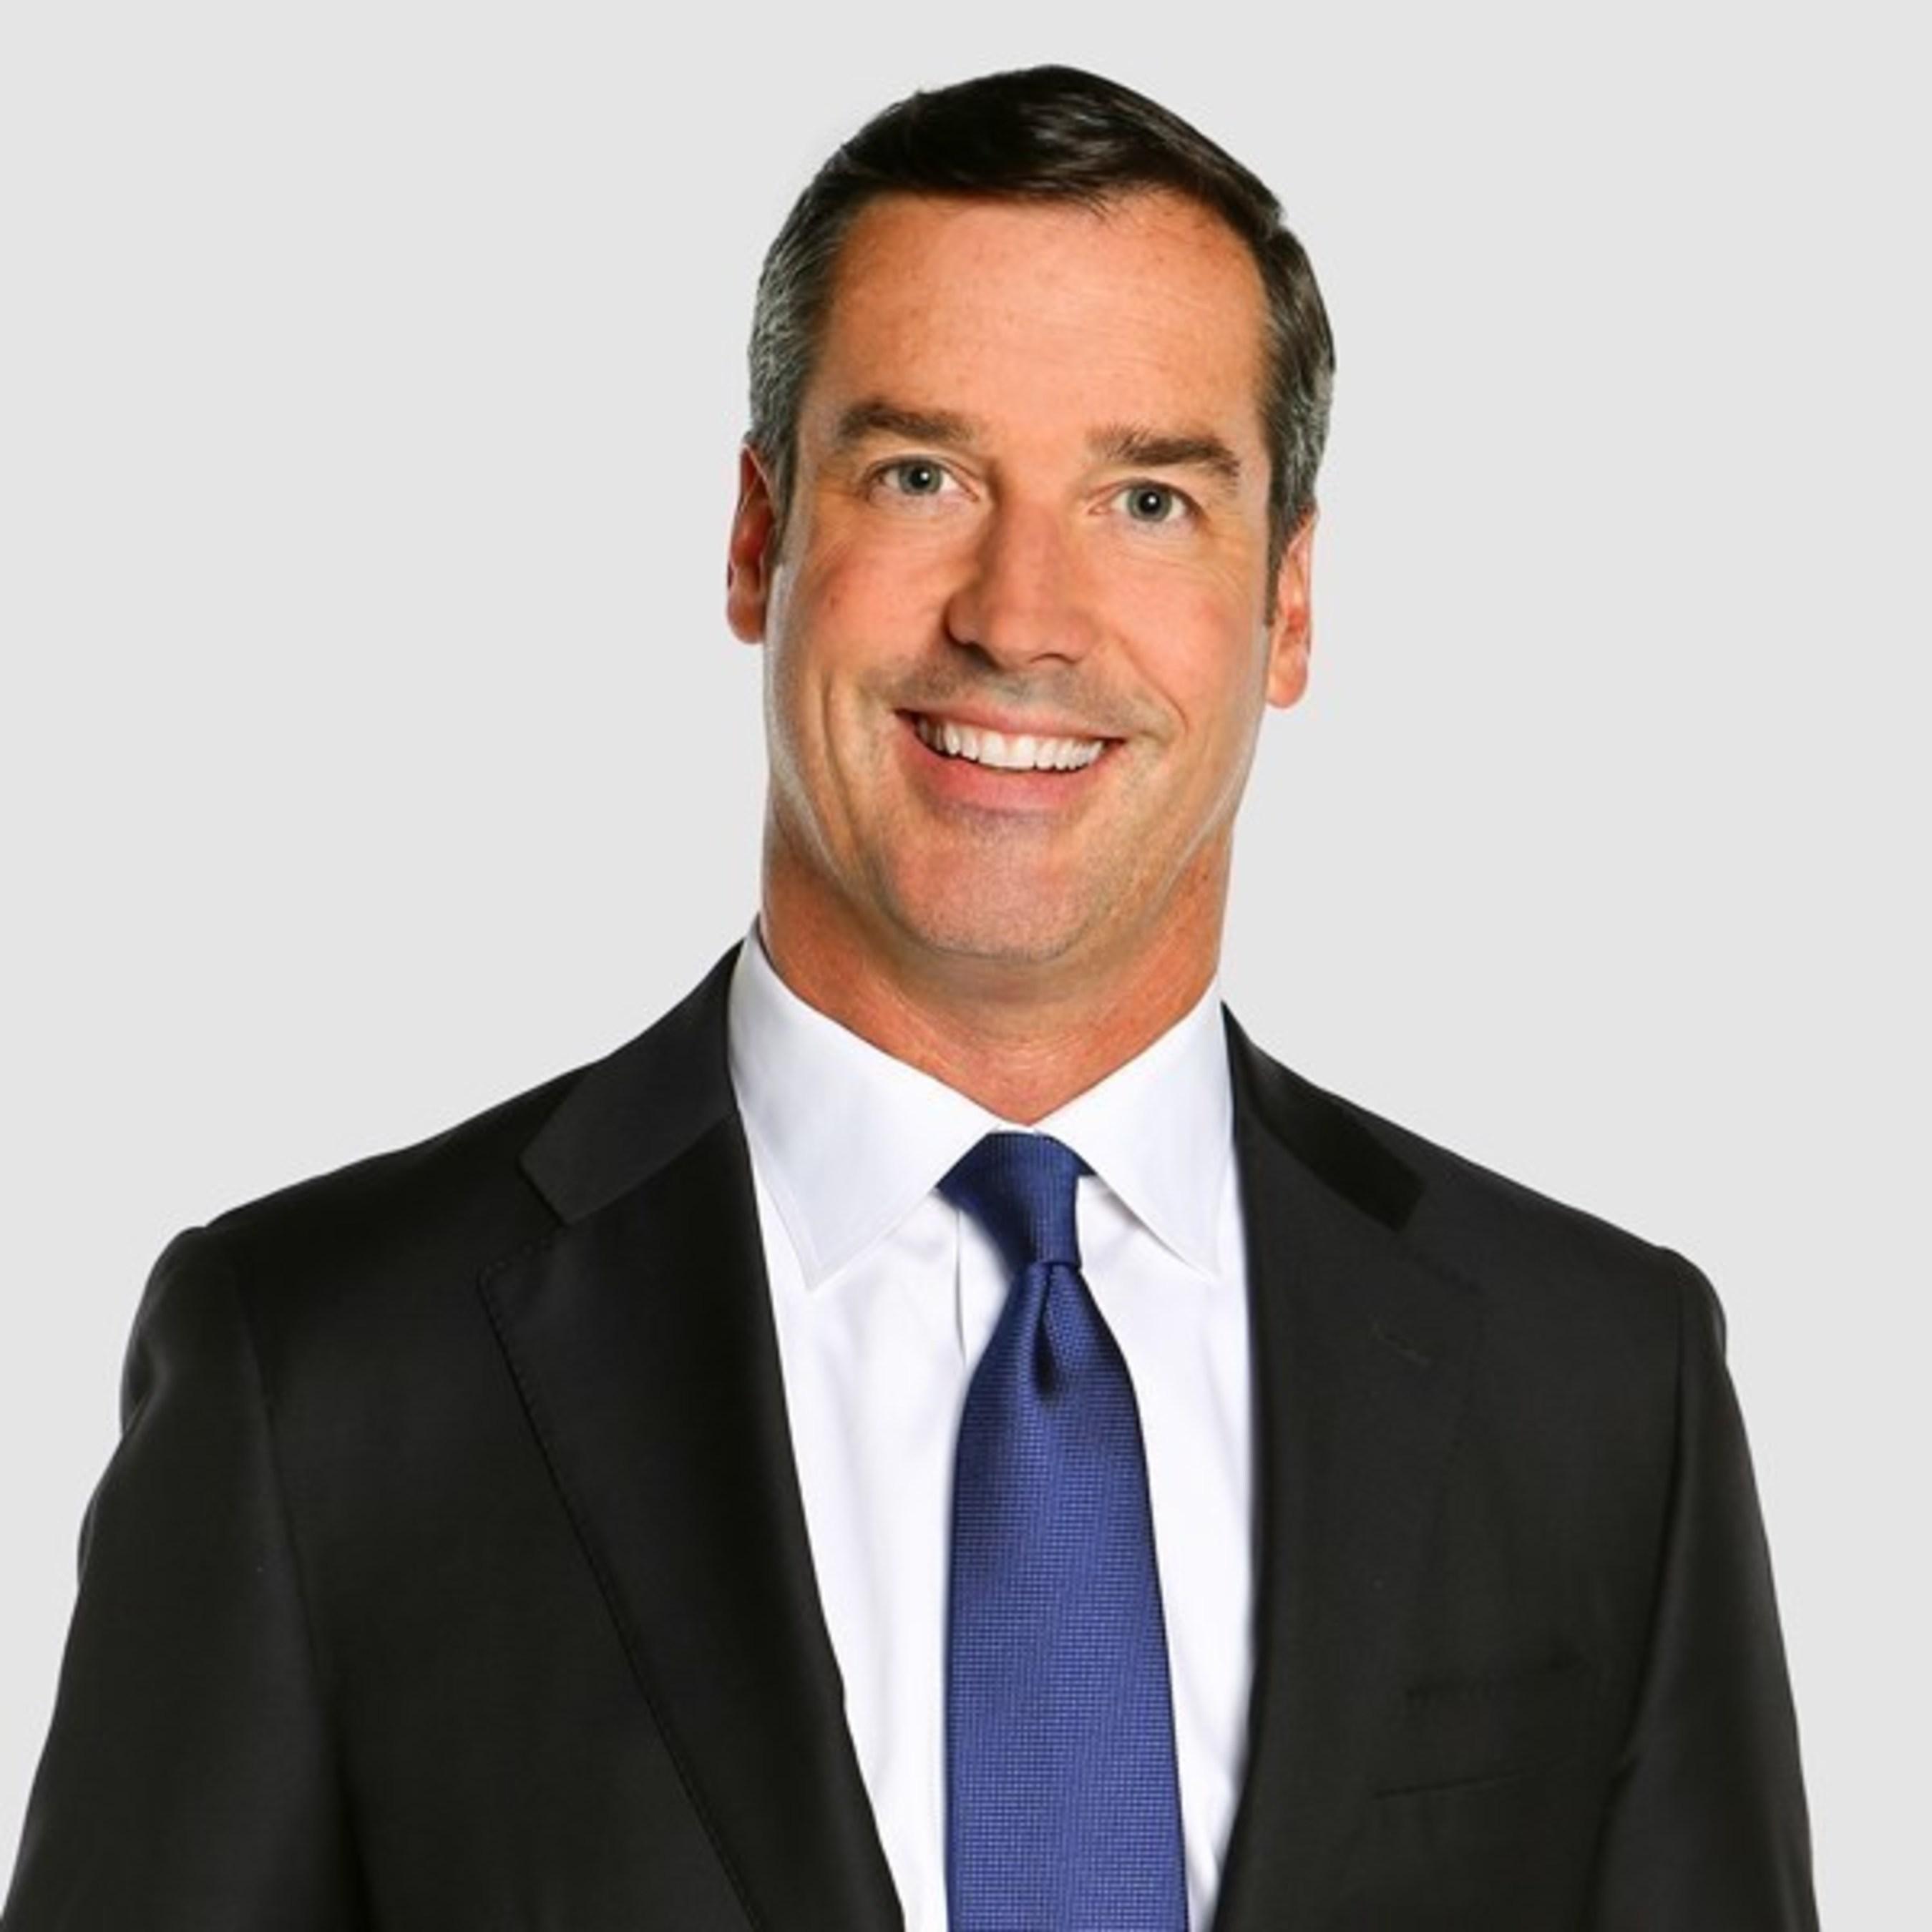 John McDonough, Head of Distribution and Marketing, OppenheimerFunds